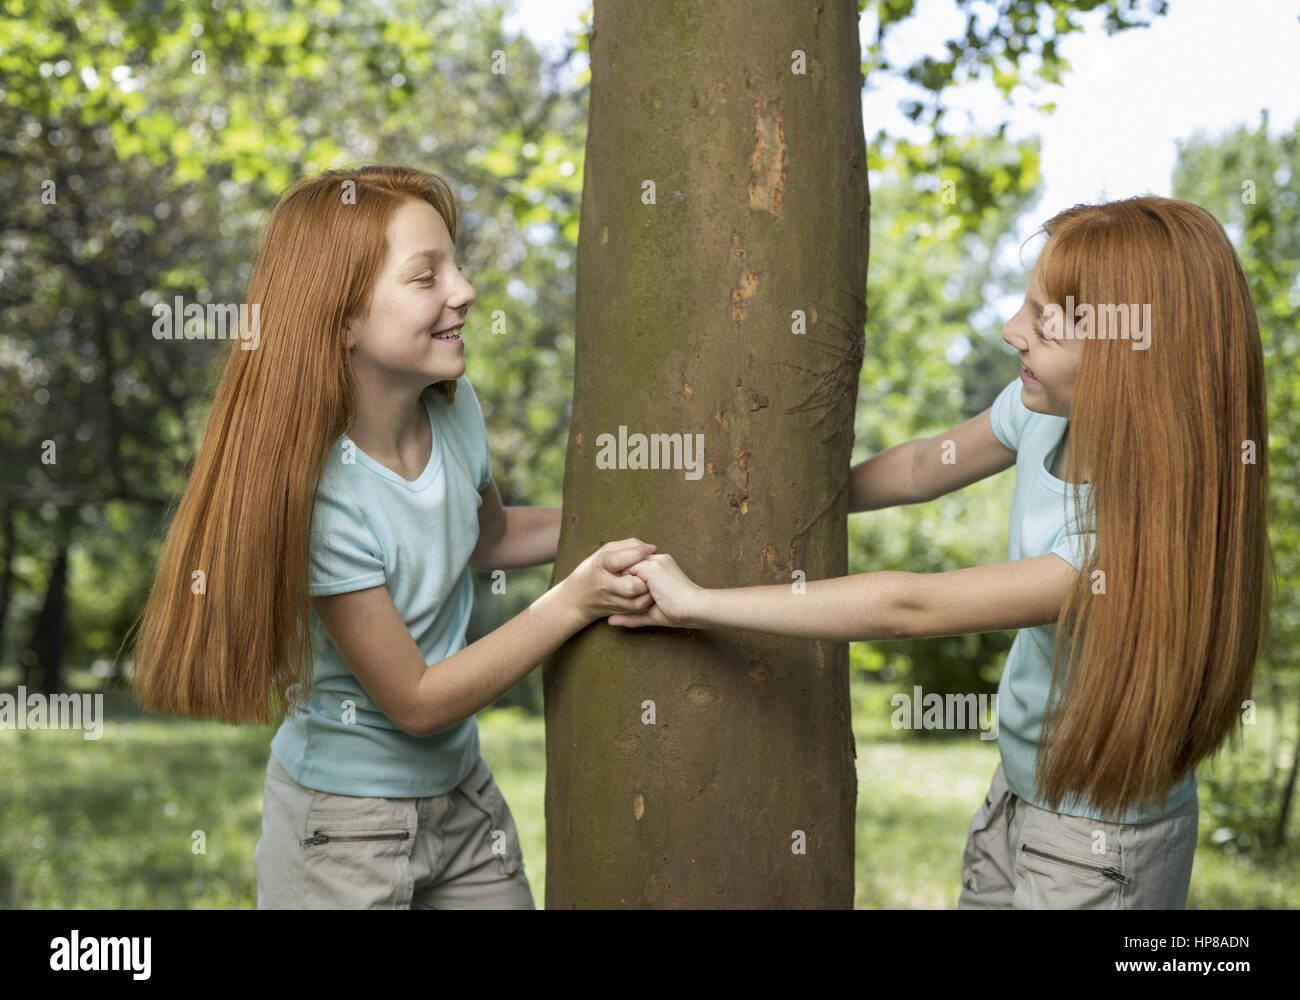 Rothaarige Zwillingsmaedchen spielen an Baumstamm (model-released) - Stock Image